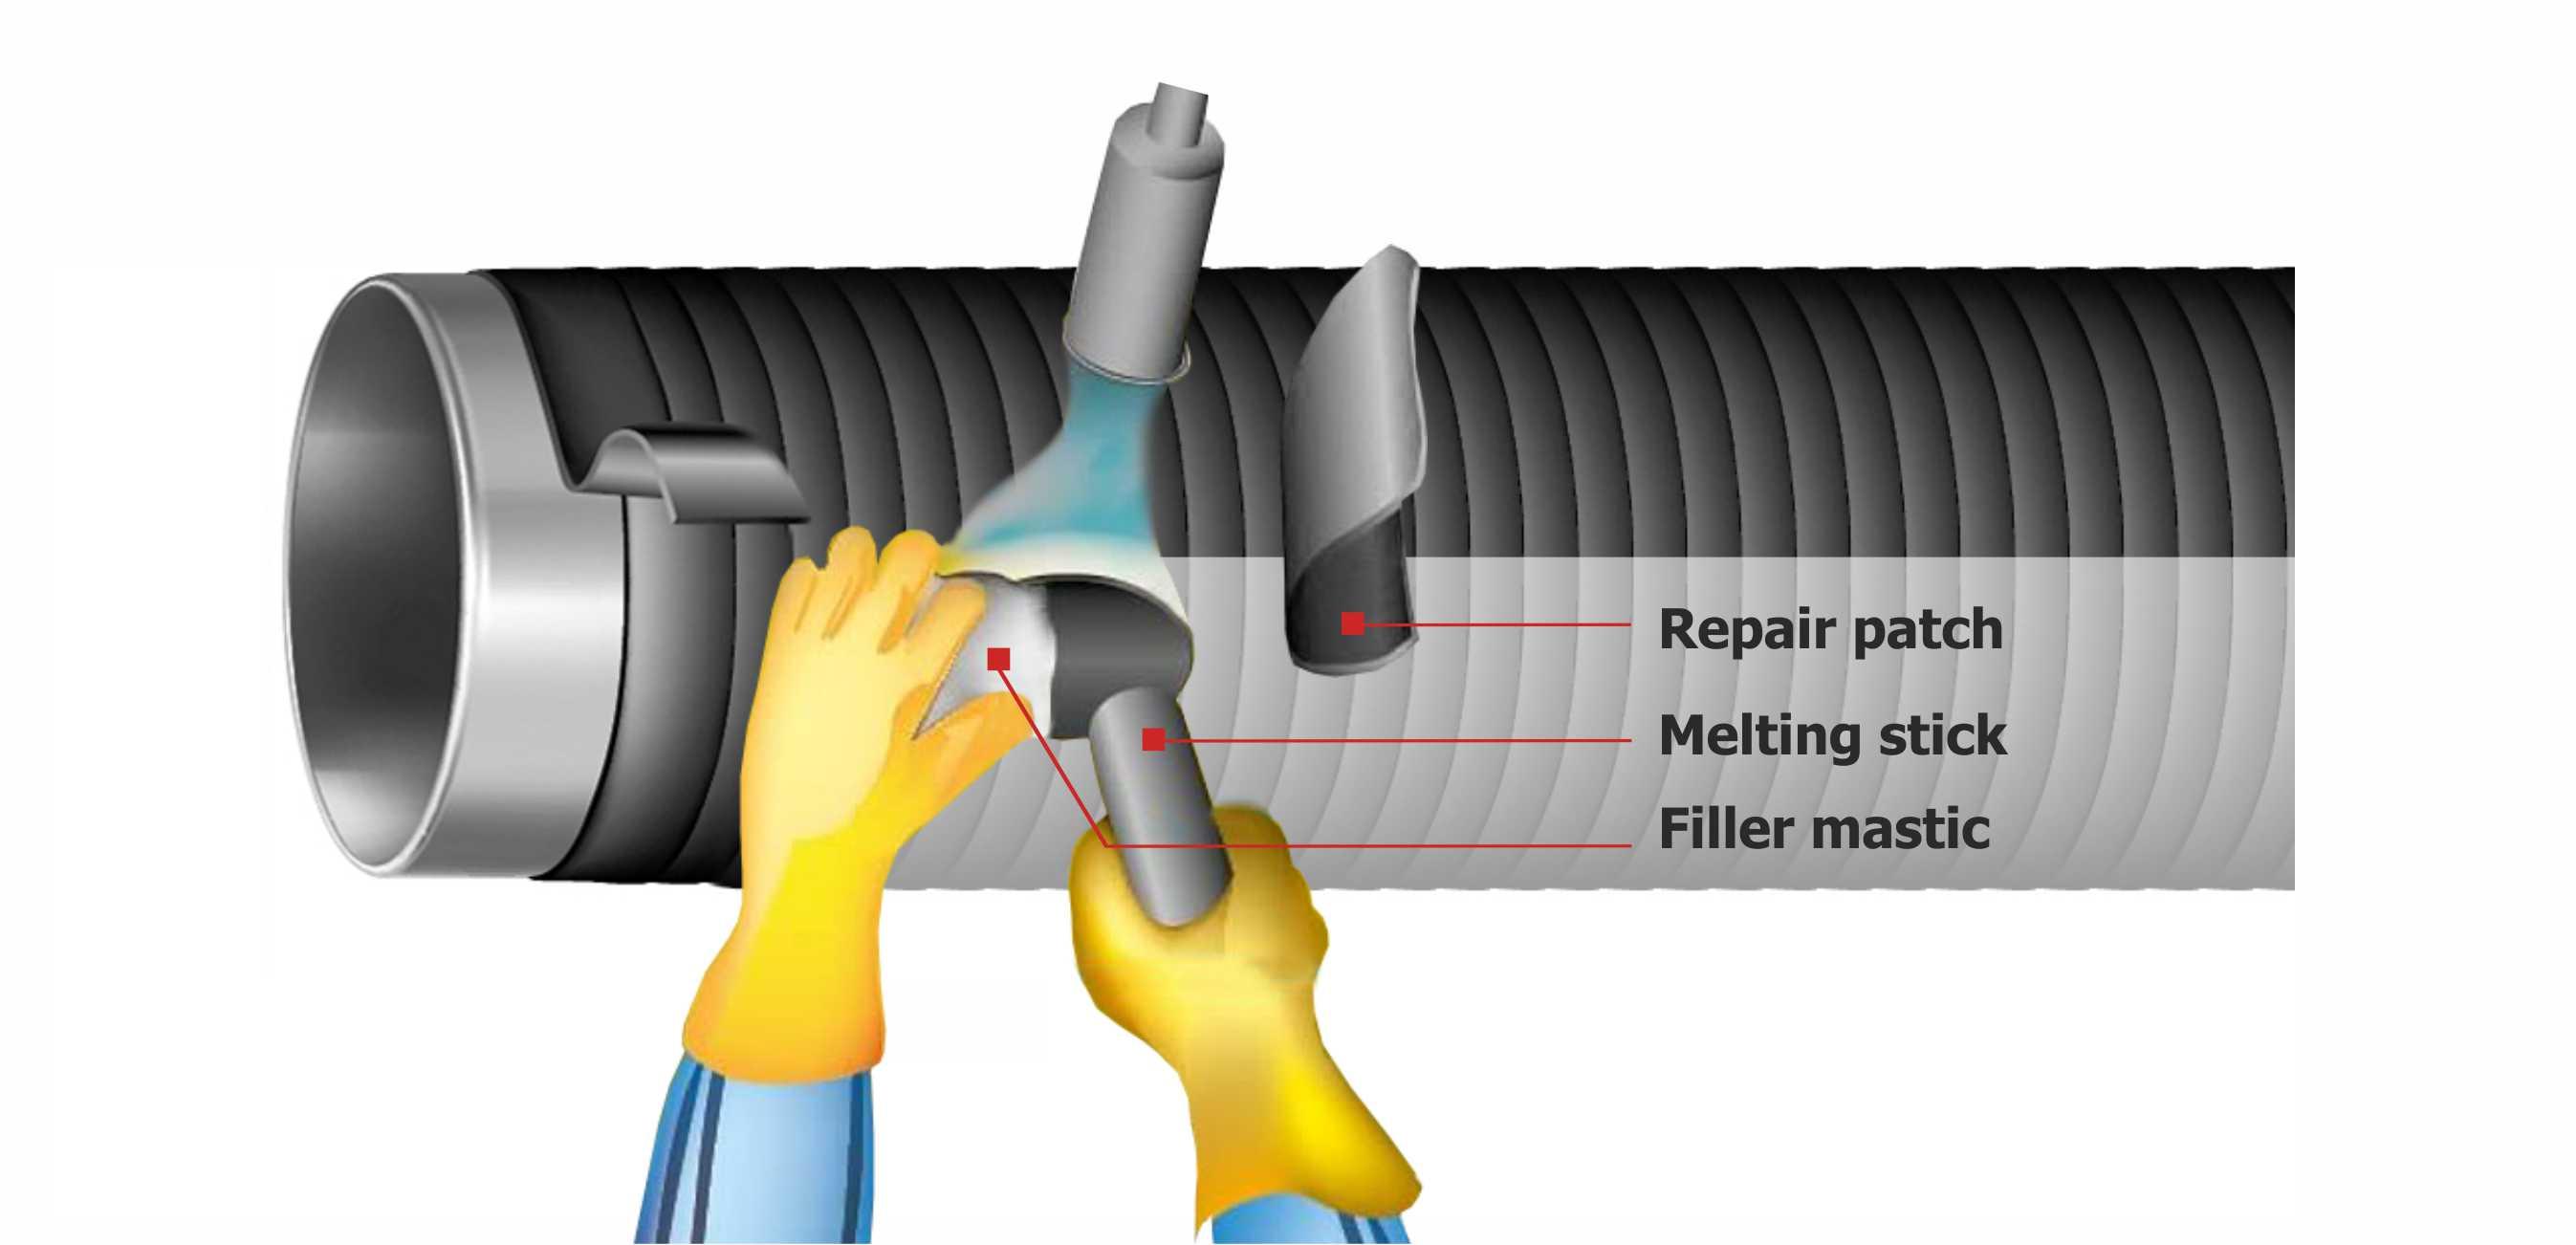 Illustration REPAIRING SYSTEM DK-PROTEC®